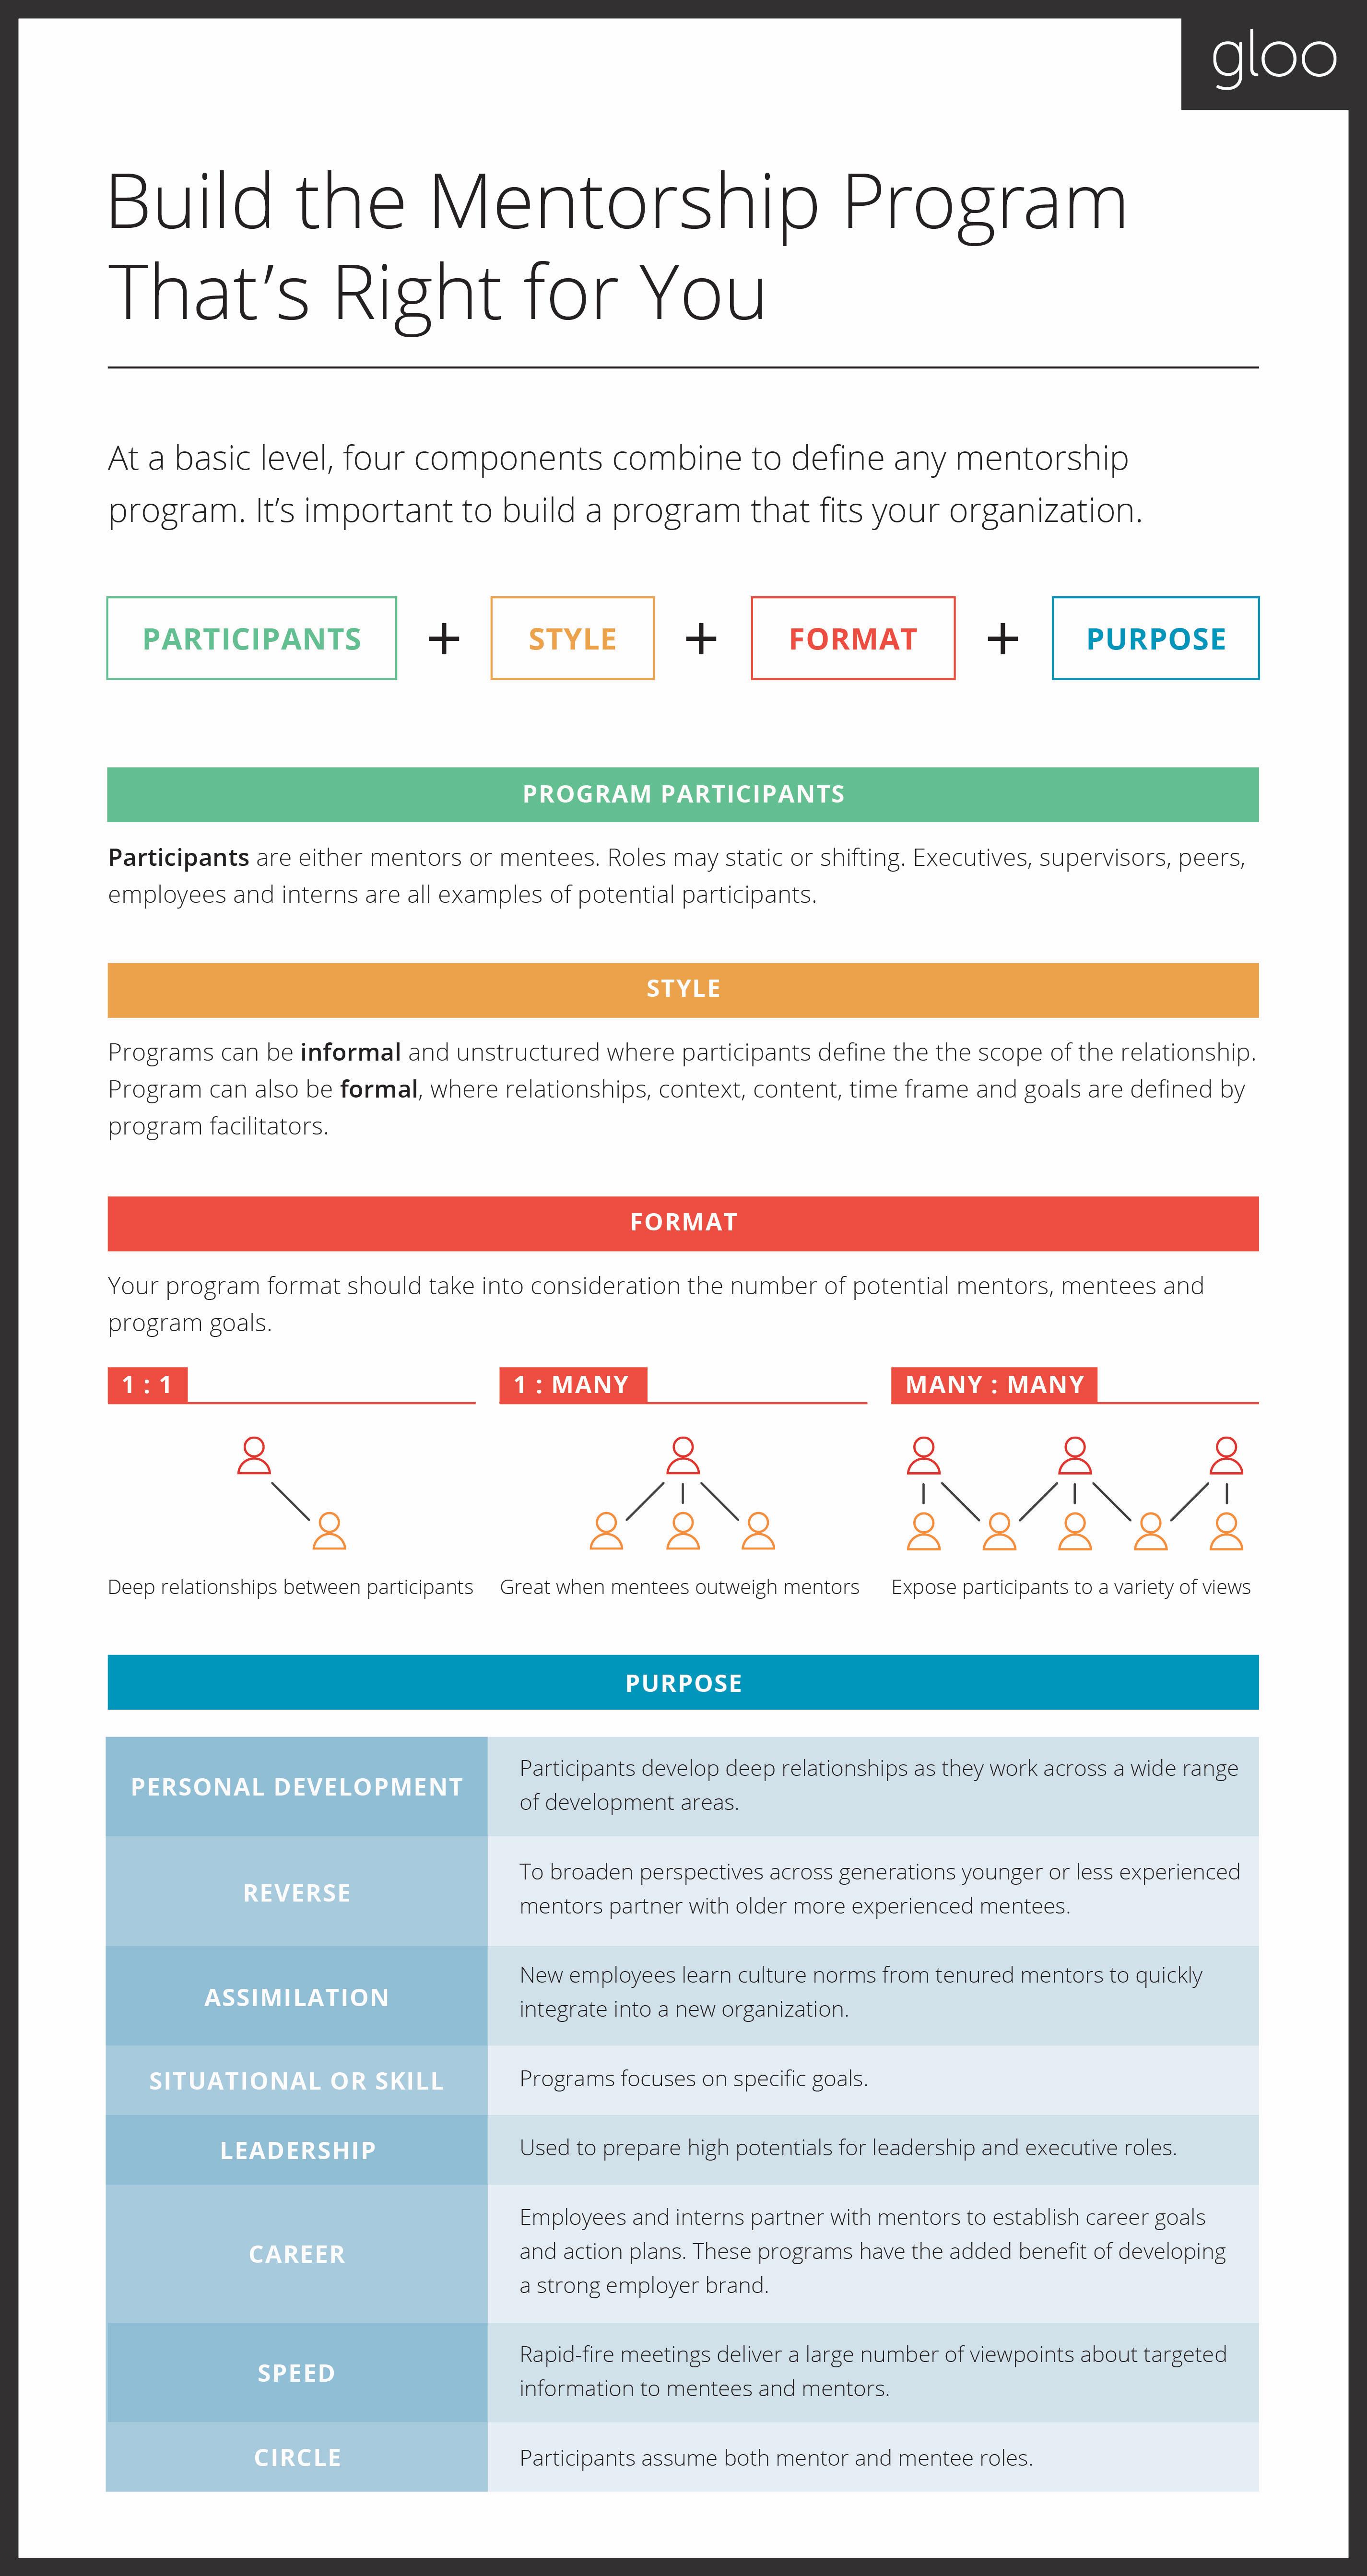 Types of mentorship programs image